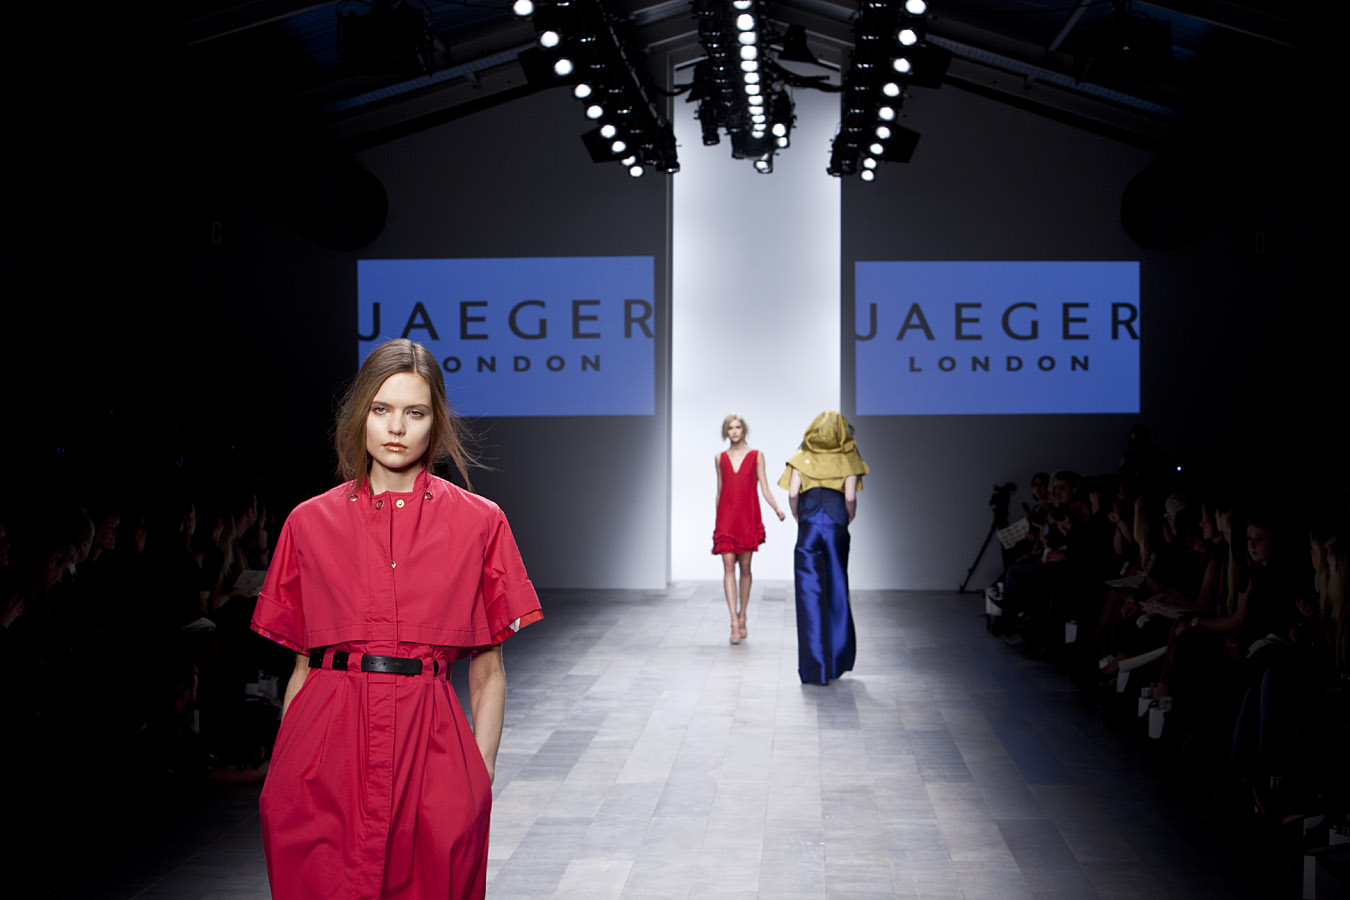 London Fashion Week Jaeger Catwalk Show photo by Margaret Yescombe Photographer London